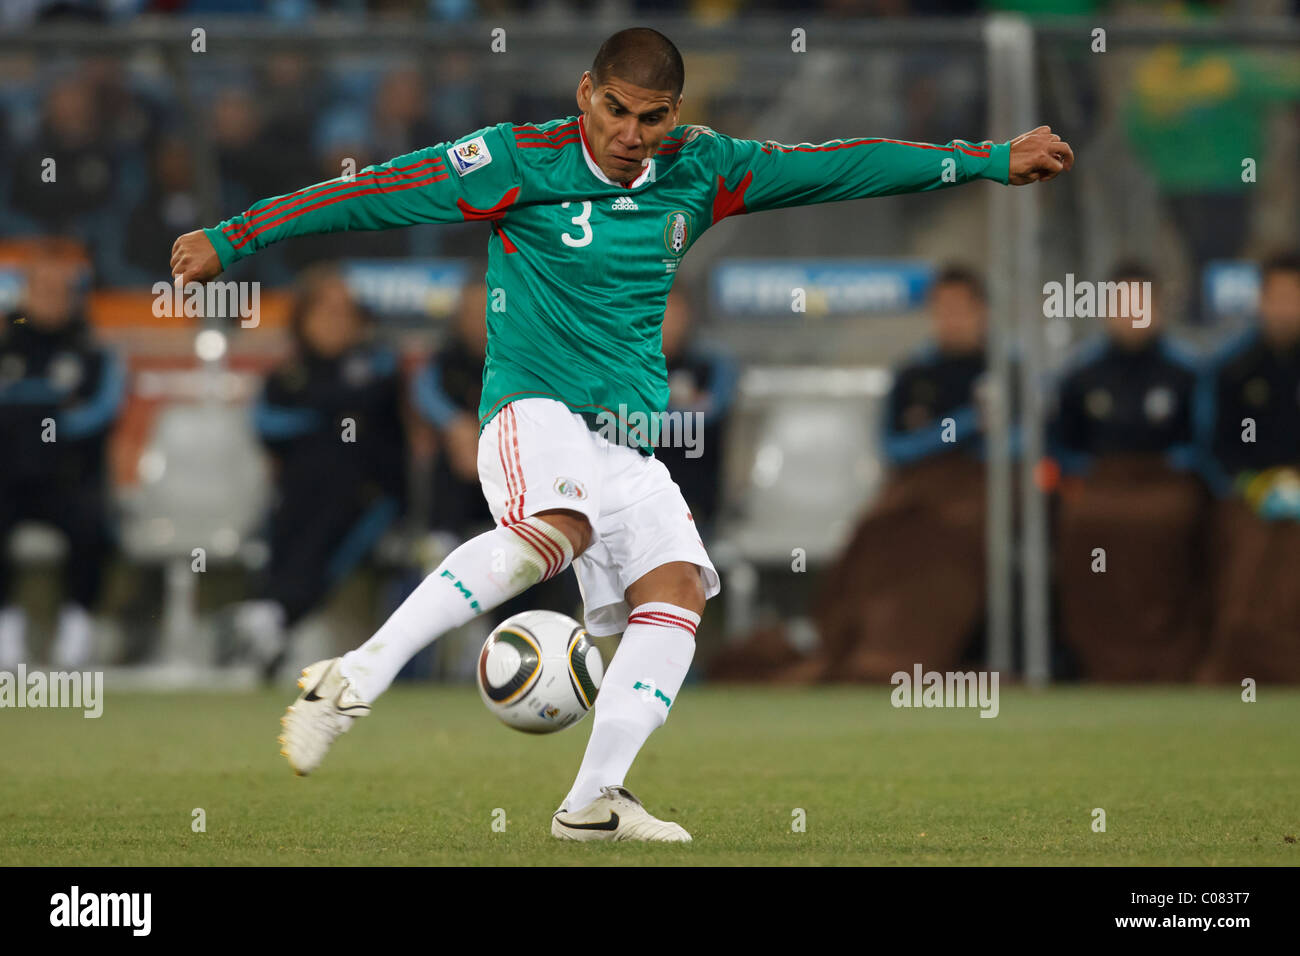 ec5b0de68 Carlos Salcido of Mexico kicks the ball during a 2010 FIFA World Cup round  of 16